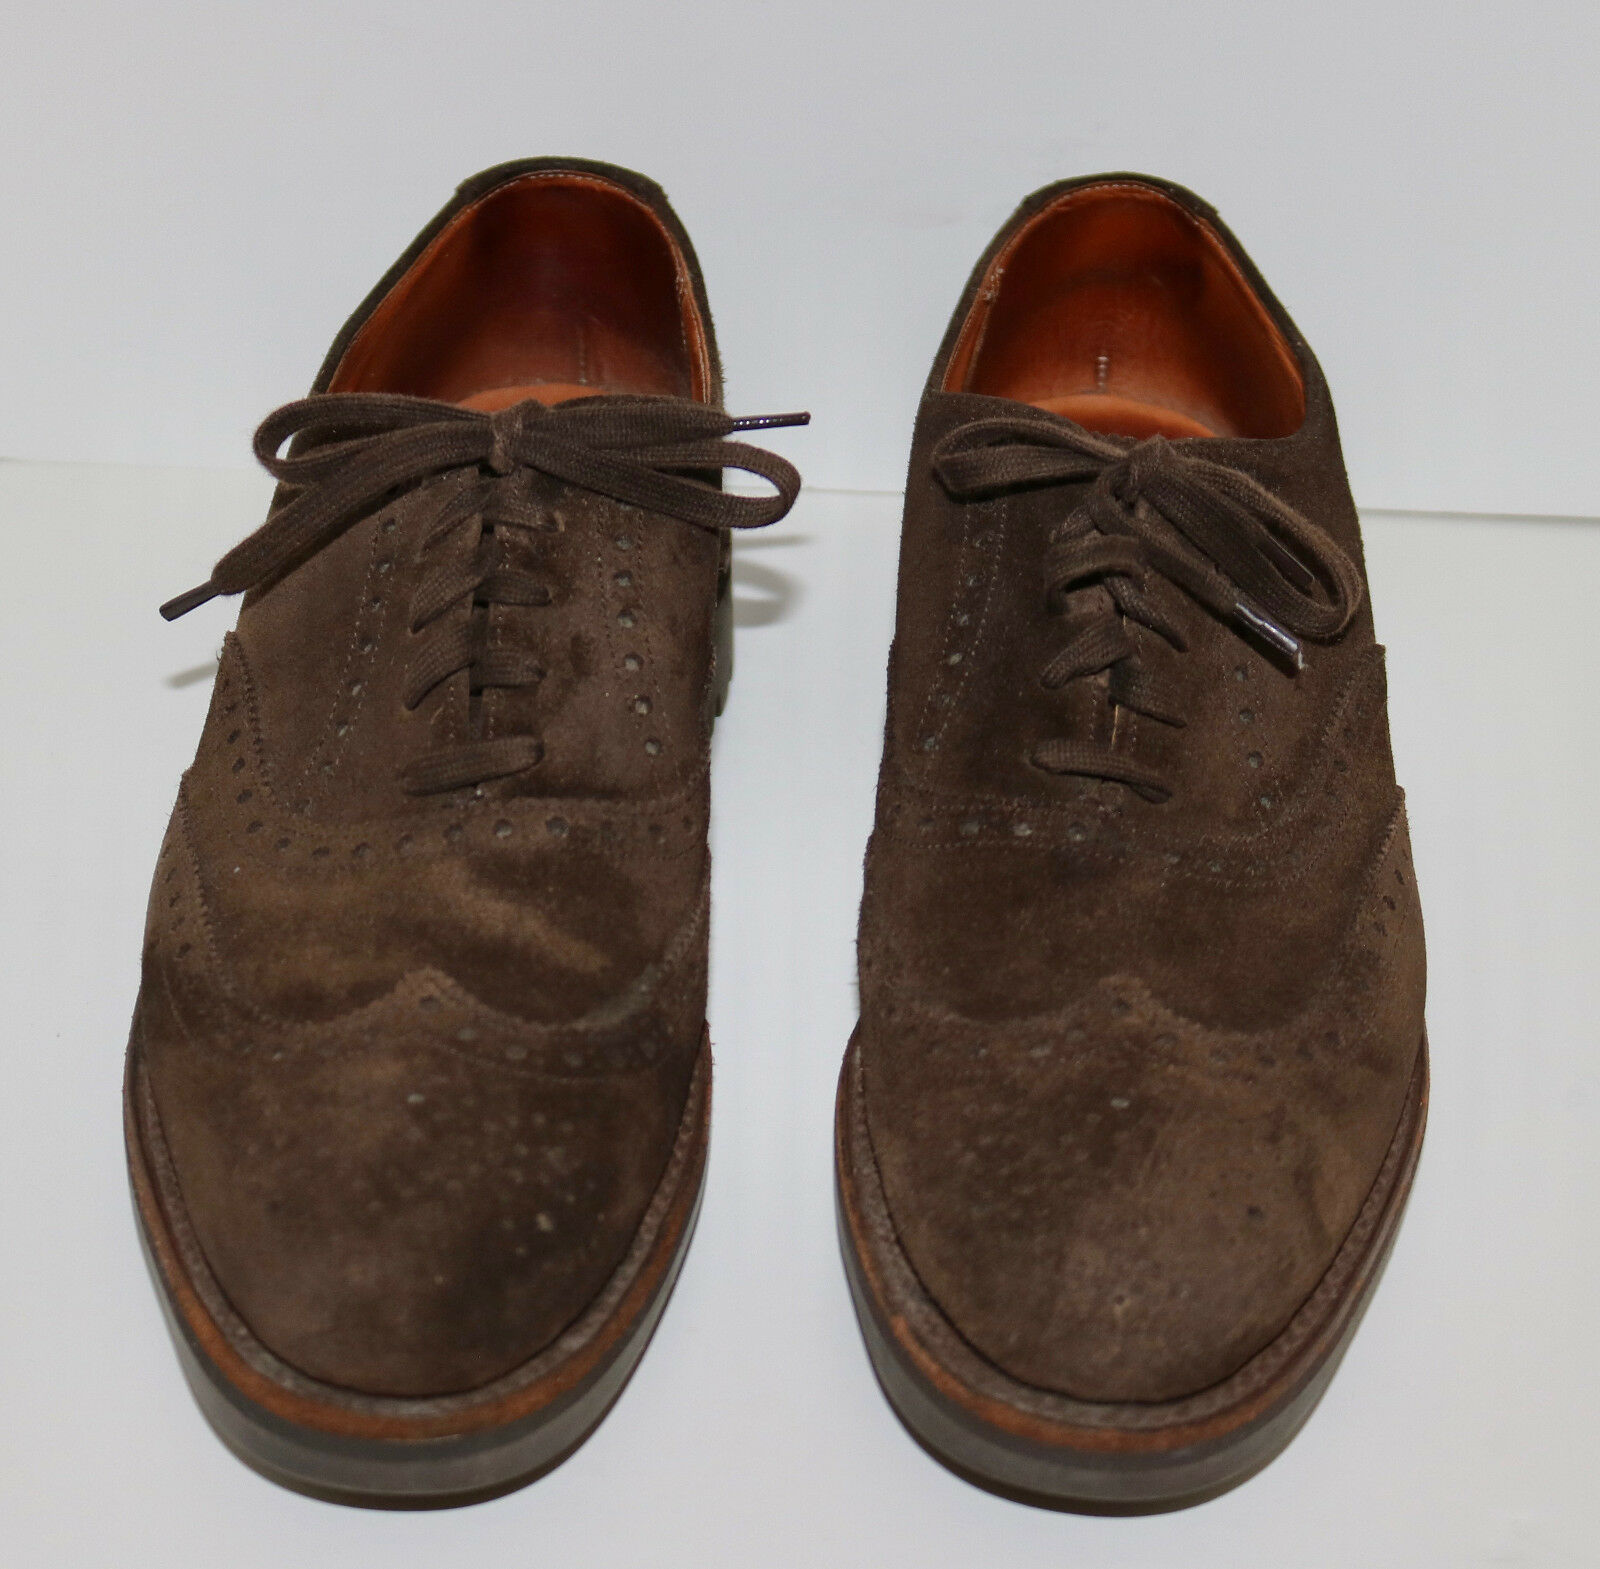 Polo Ralph Lauren vintage Ballantyne suede spectator wing tip shoes 9 B